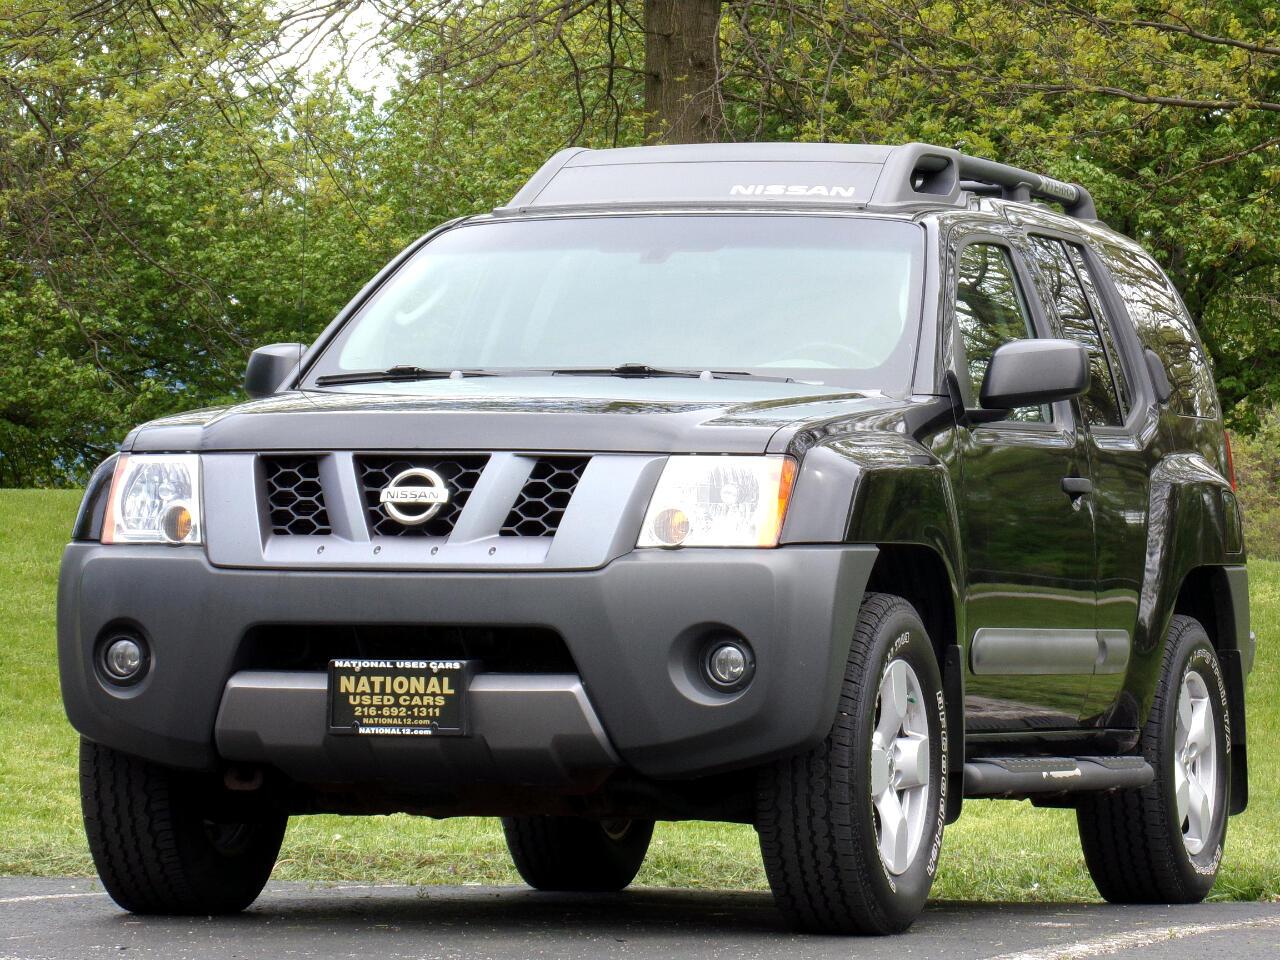 Nissan Xterra OR 4WD 2006